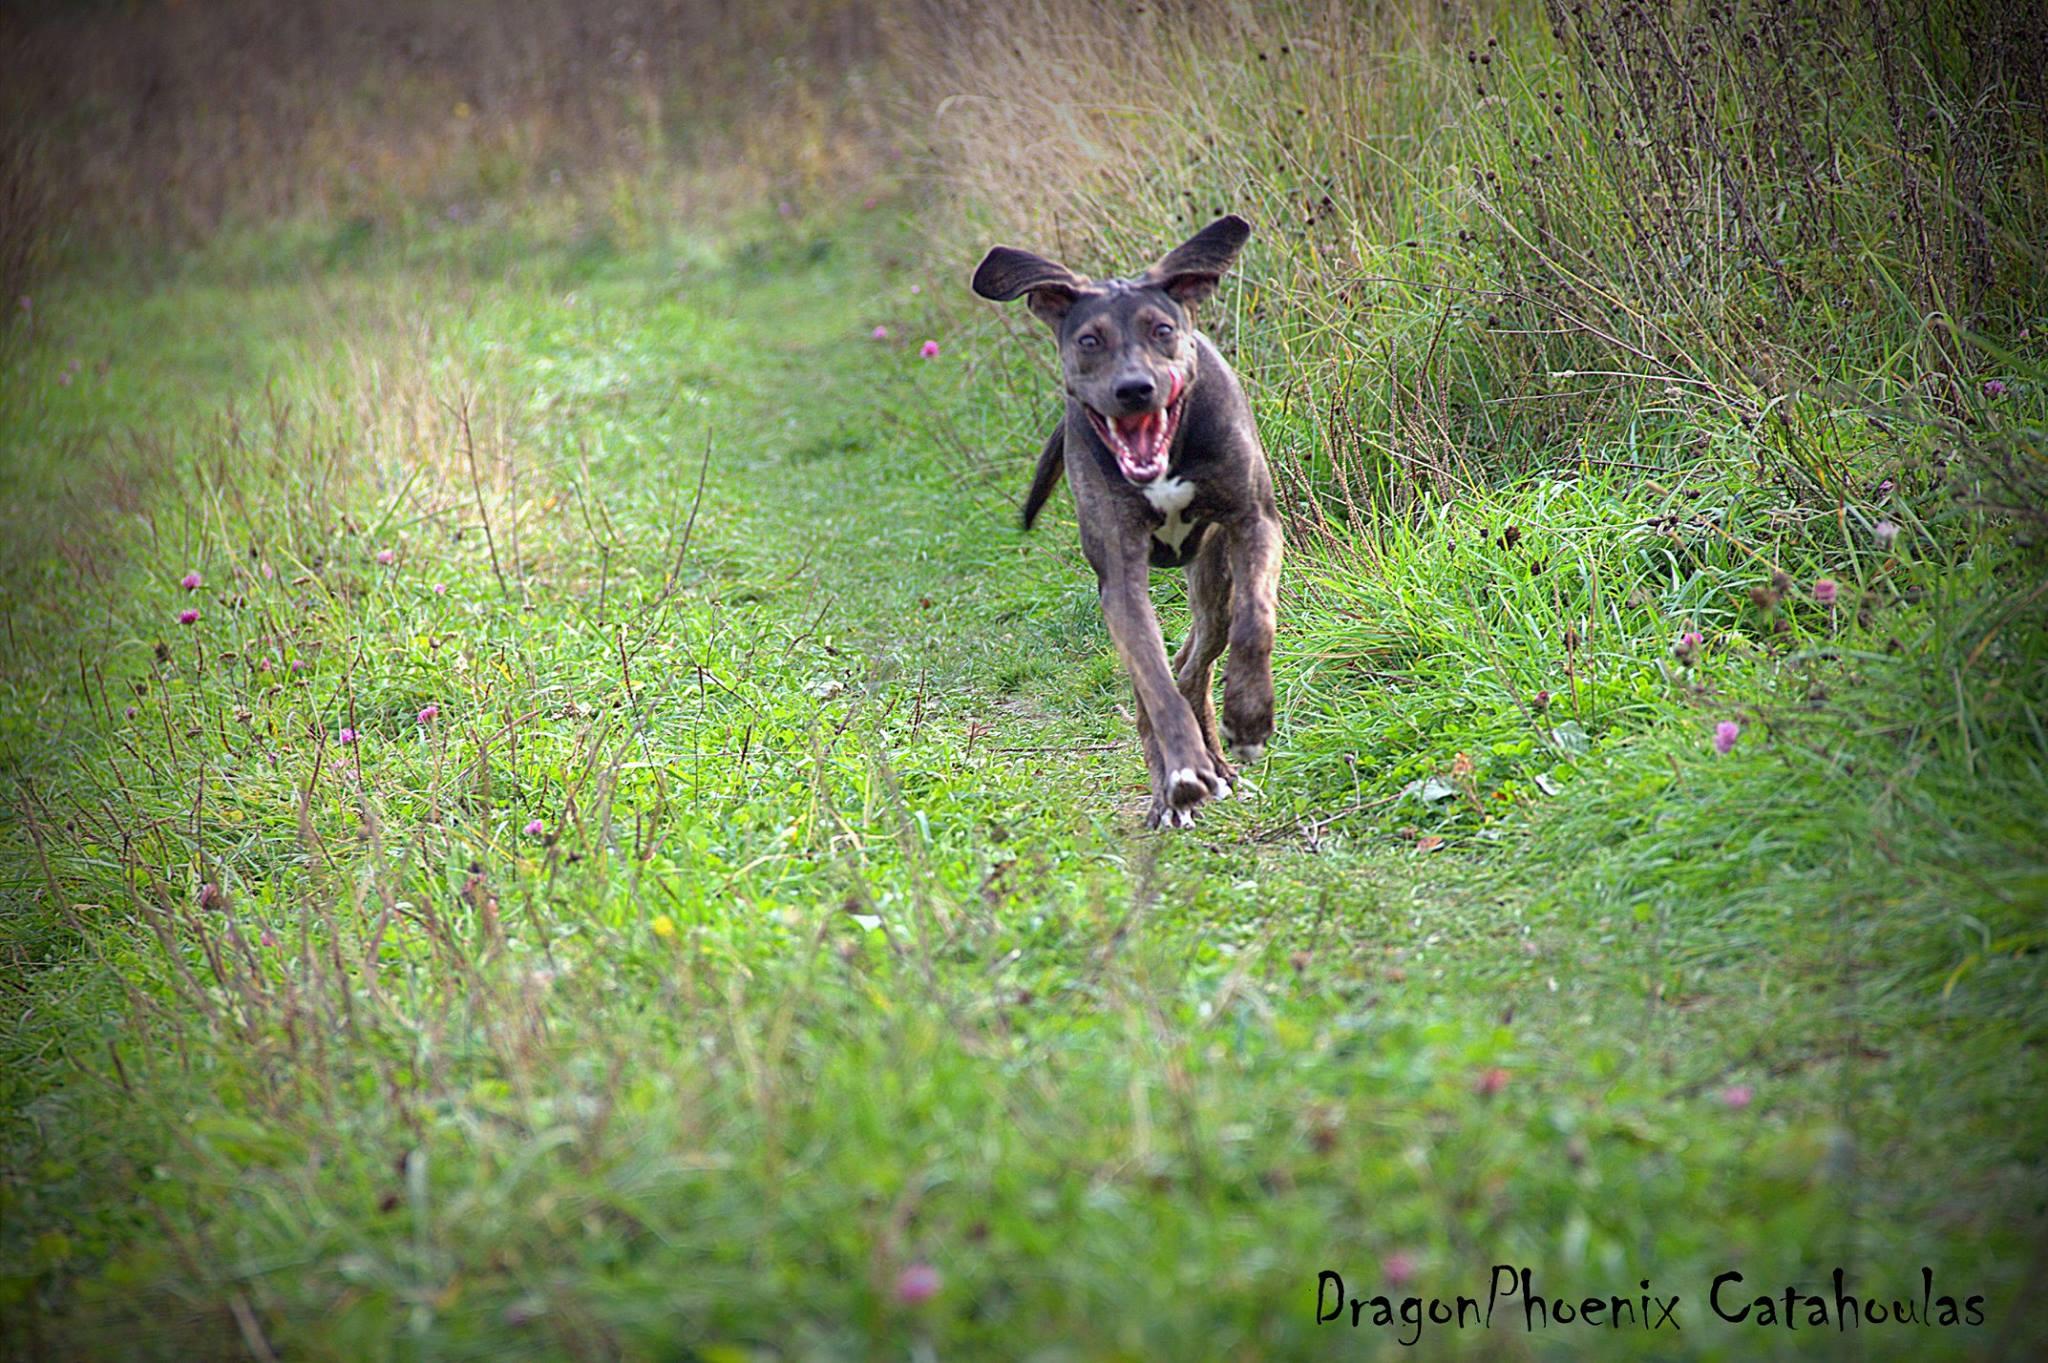 катахула охотник и пастушья собака